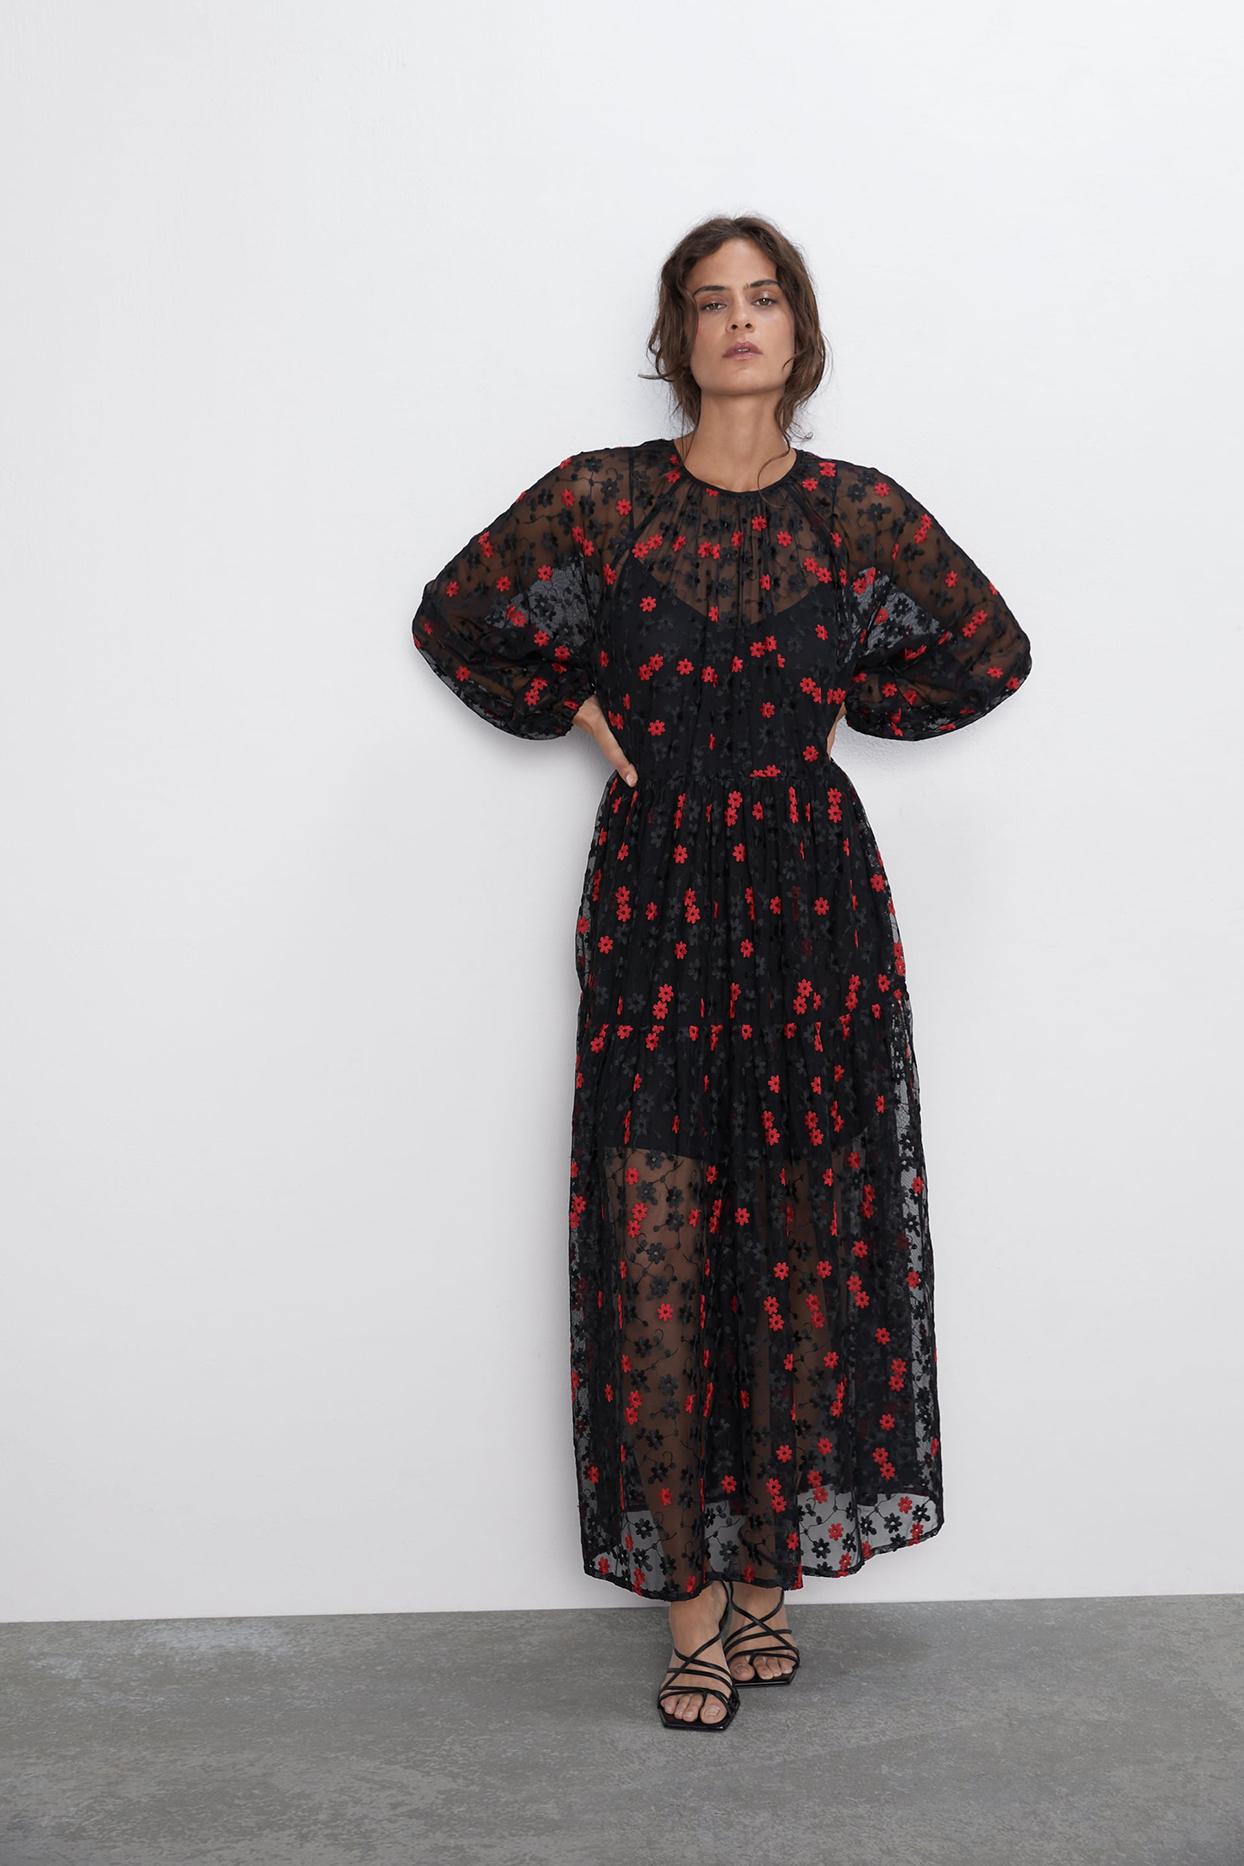 Zara Floral Embroidered Dress